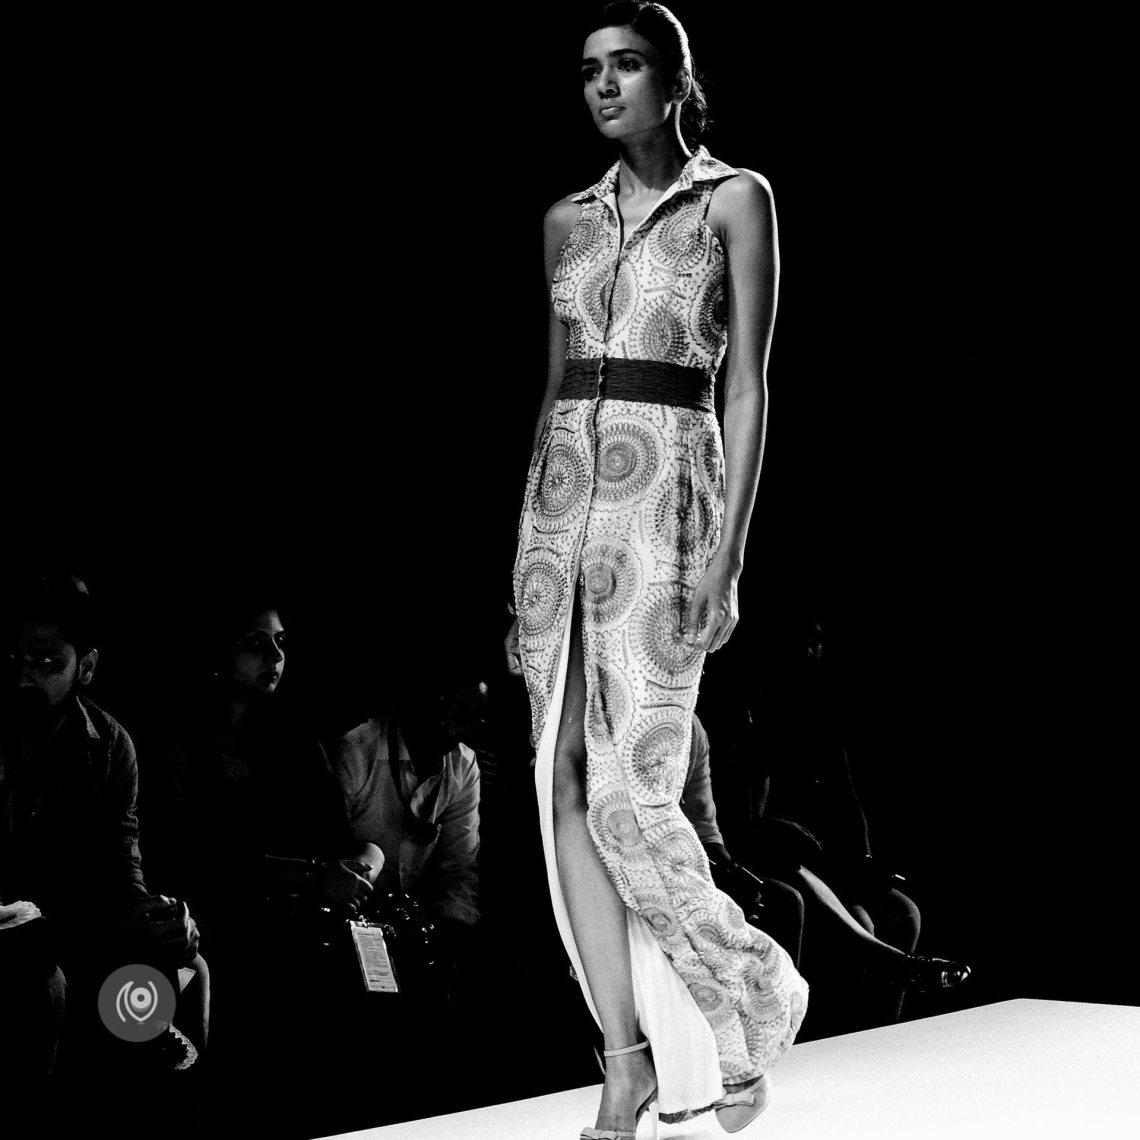 Saaj by Ankita, Amazon India Fashion Week Spring Summer 2016 #AIFWSS16 #EyesForFashion Naina.co Luxury & Lifestyle, Photographer Storyteller, Blogger